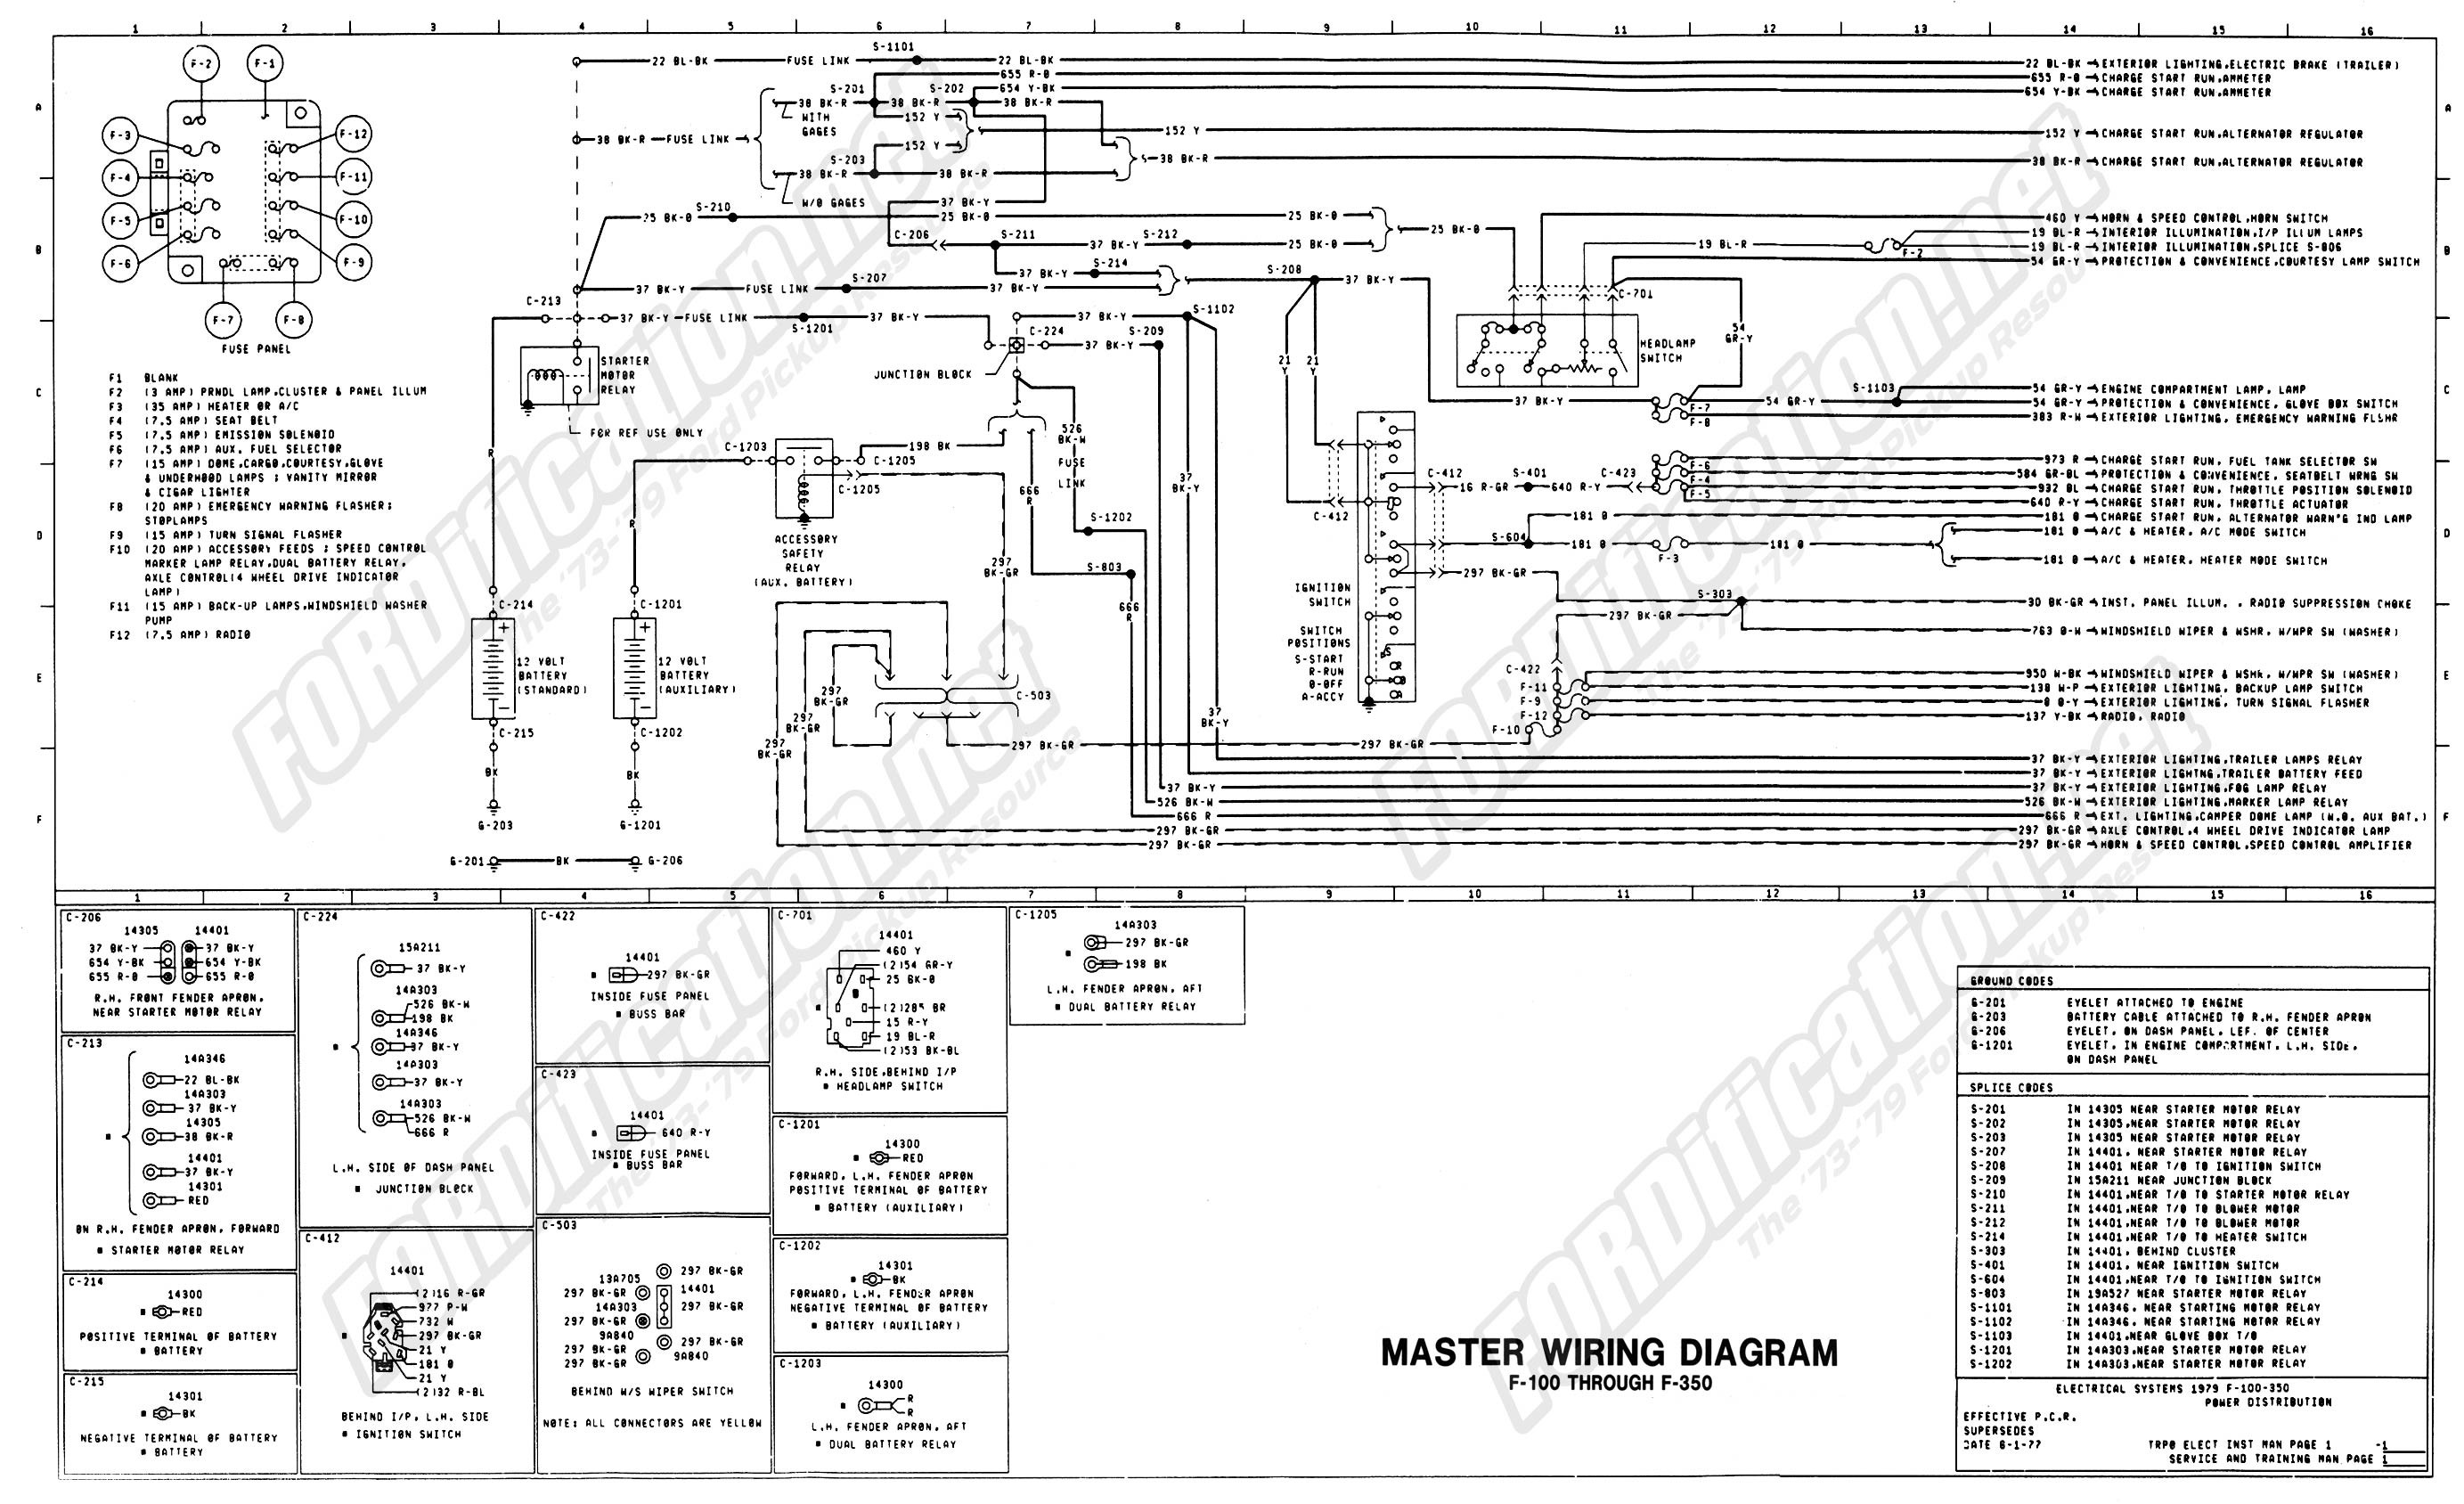 1983 Chevy Truck Wiring Diagram Wiring 79master 1of9 for 79 Chevy Truck  Diagram Wiring Diagram Of